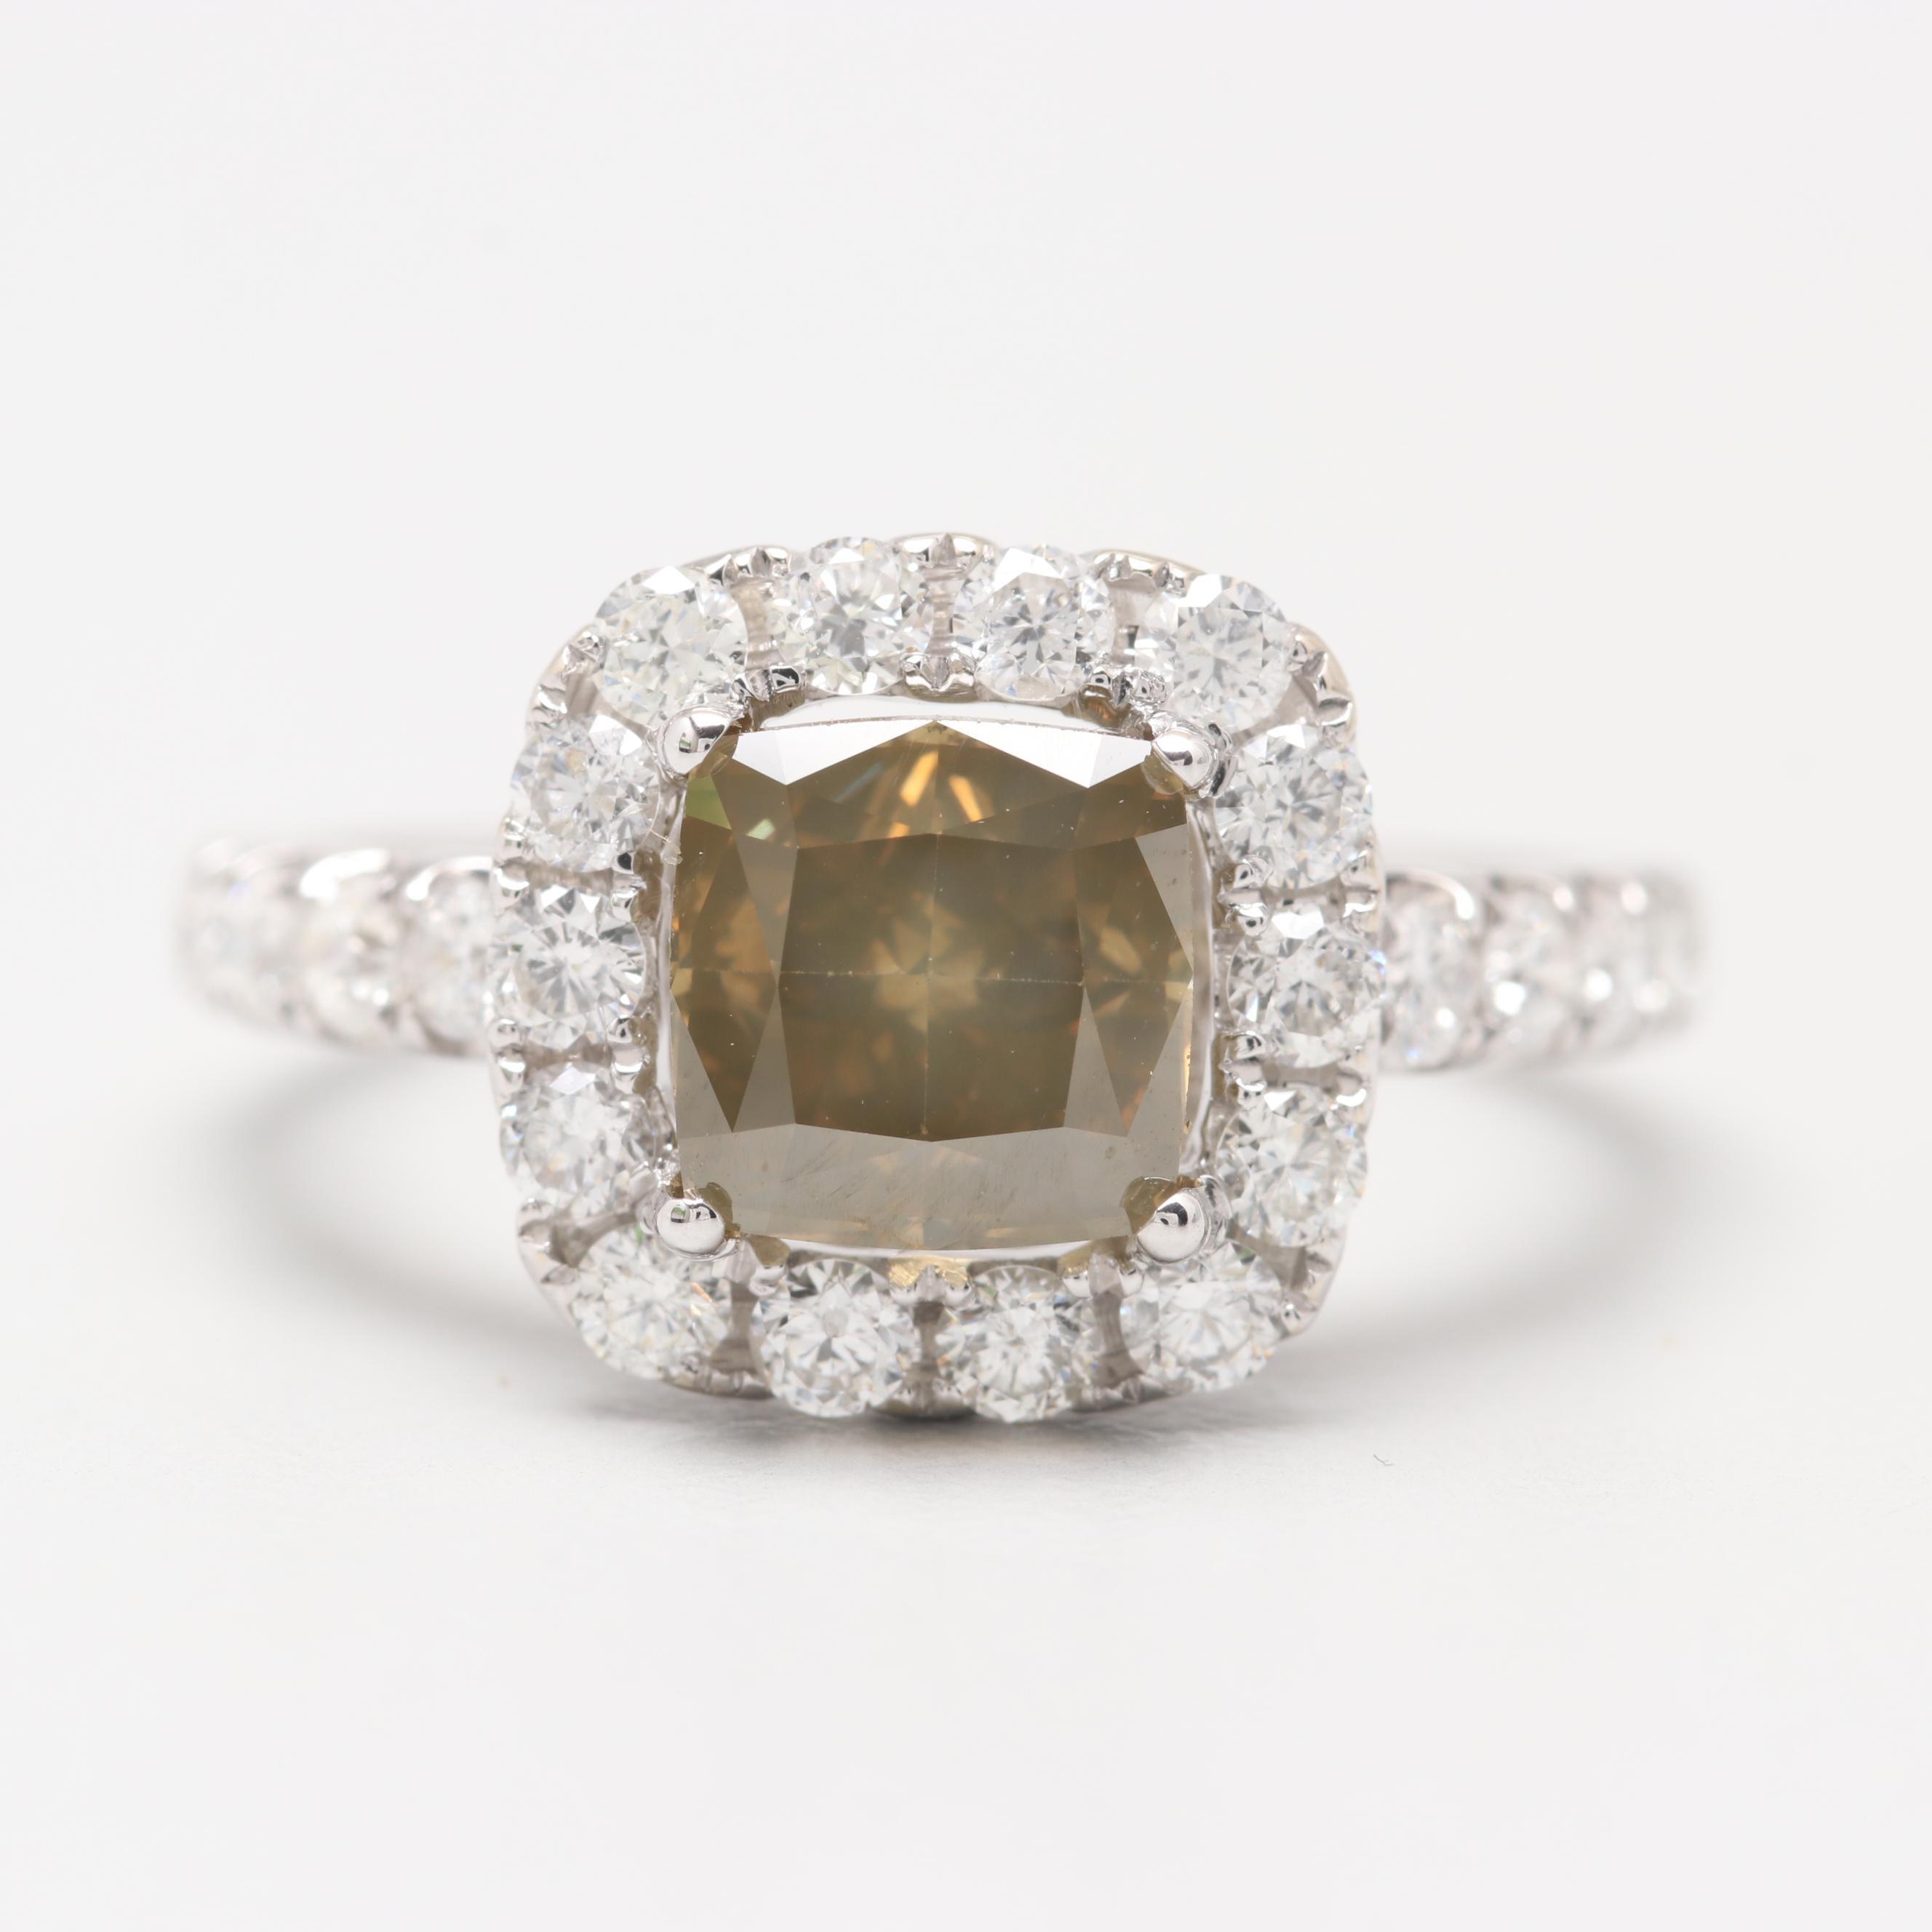 18K White Gold 2.23 CTW Diamond Ring Featuring Fancy Color Diamond